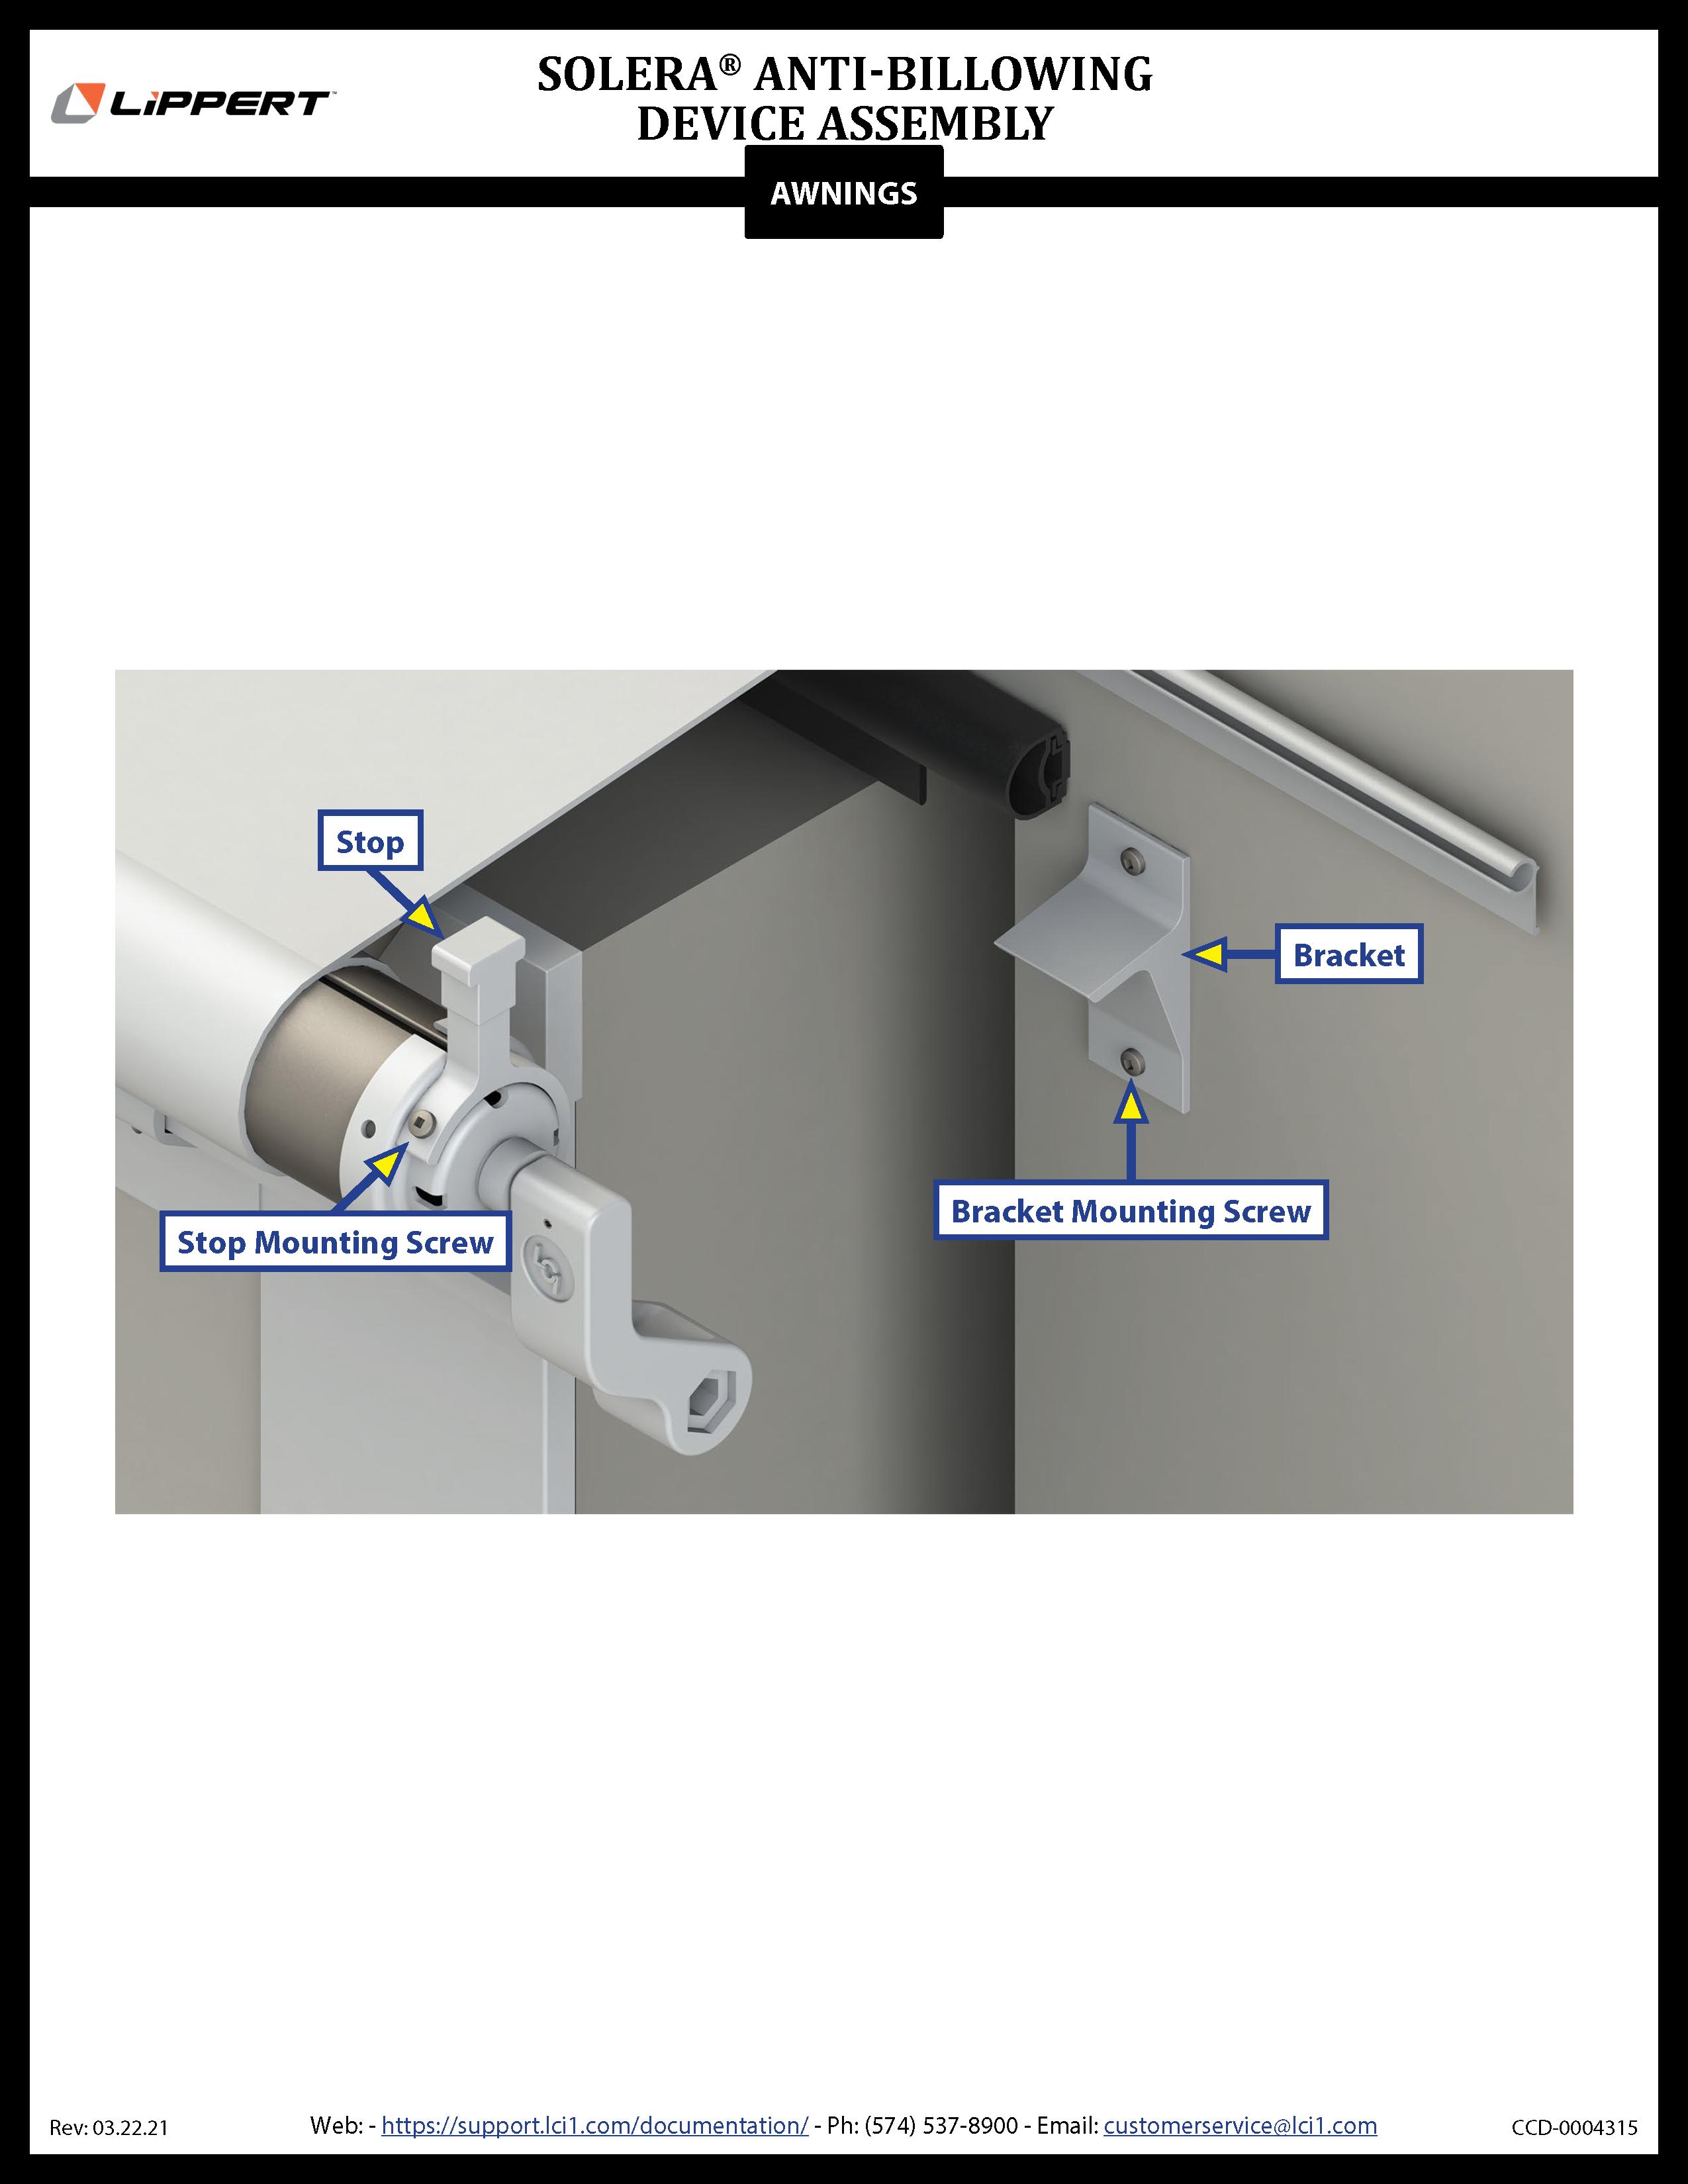 Solera® Anti-Billowing Device Assembly